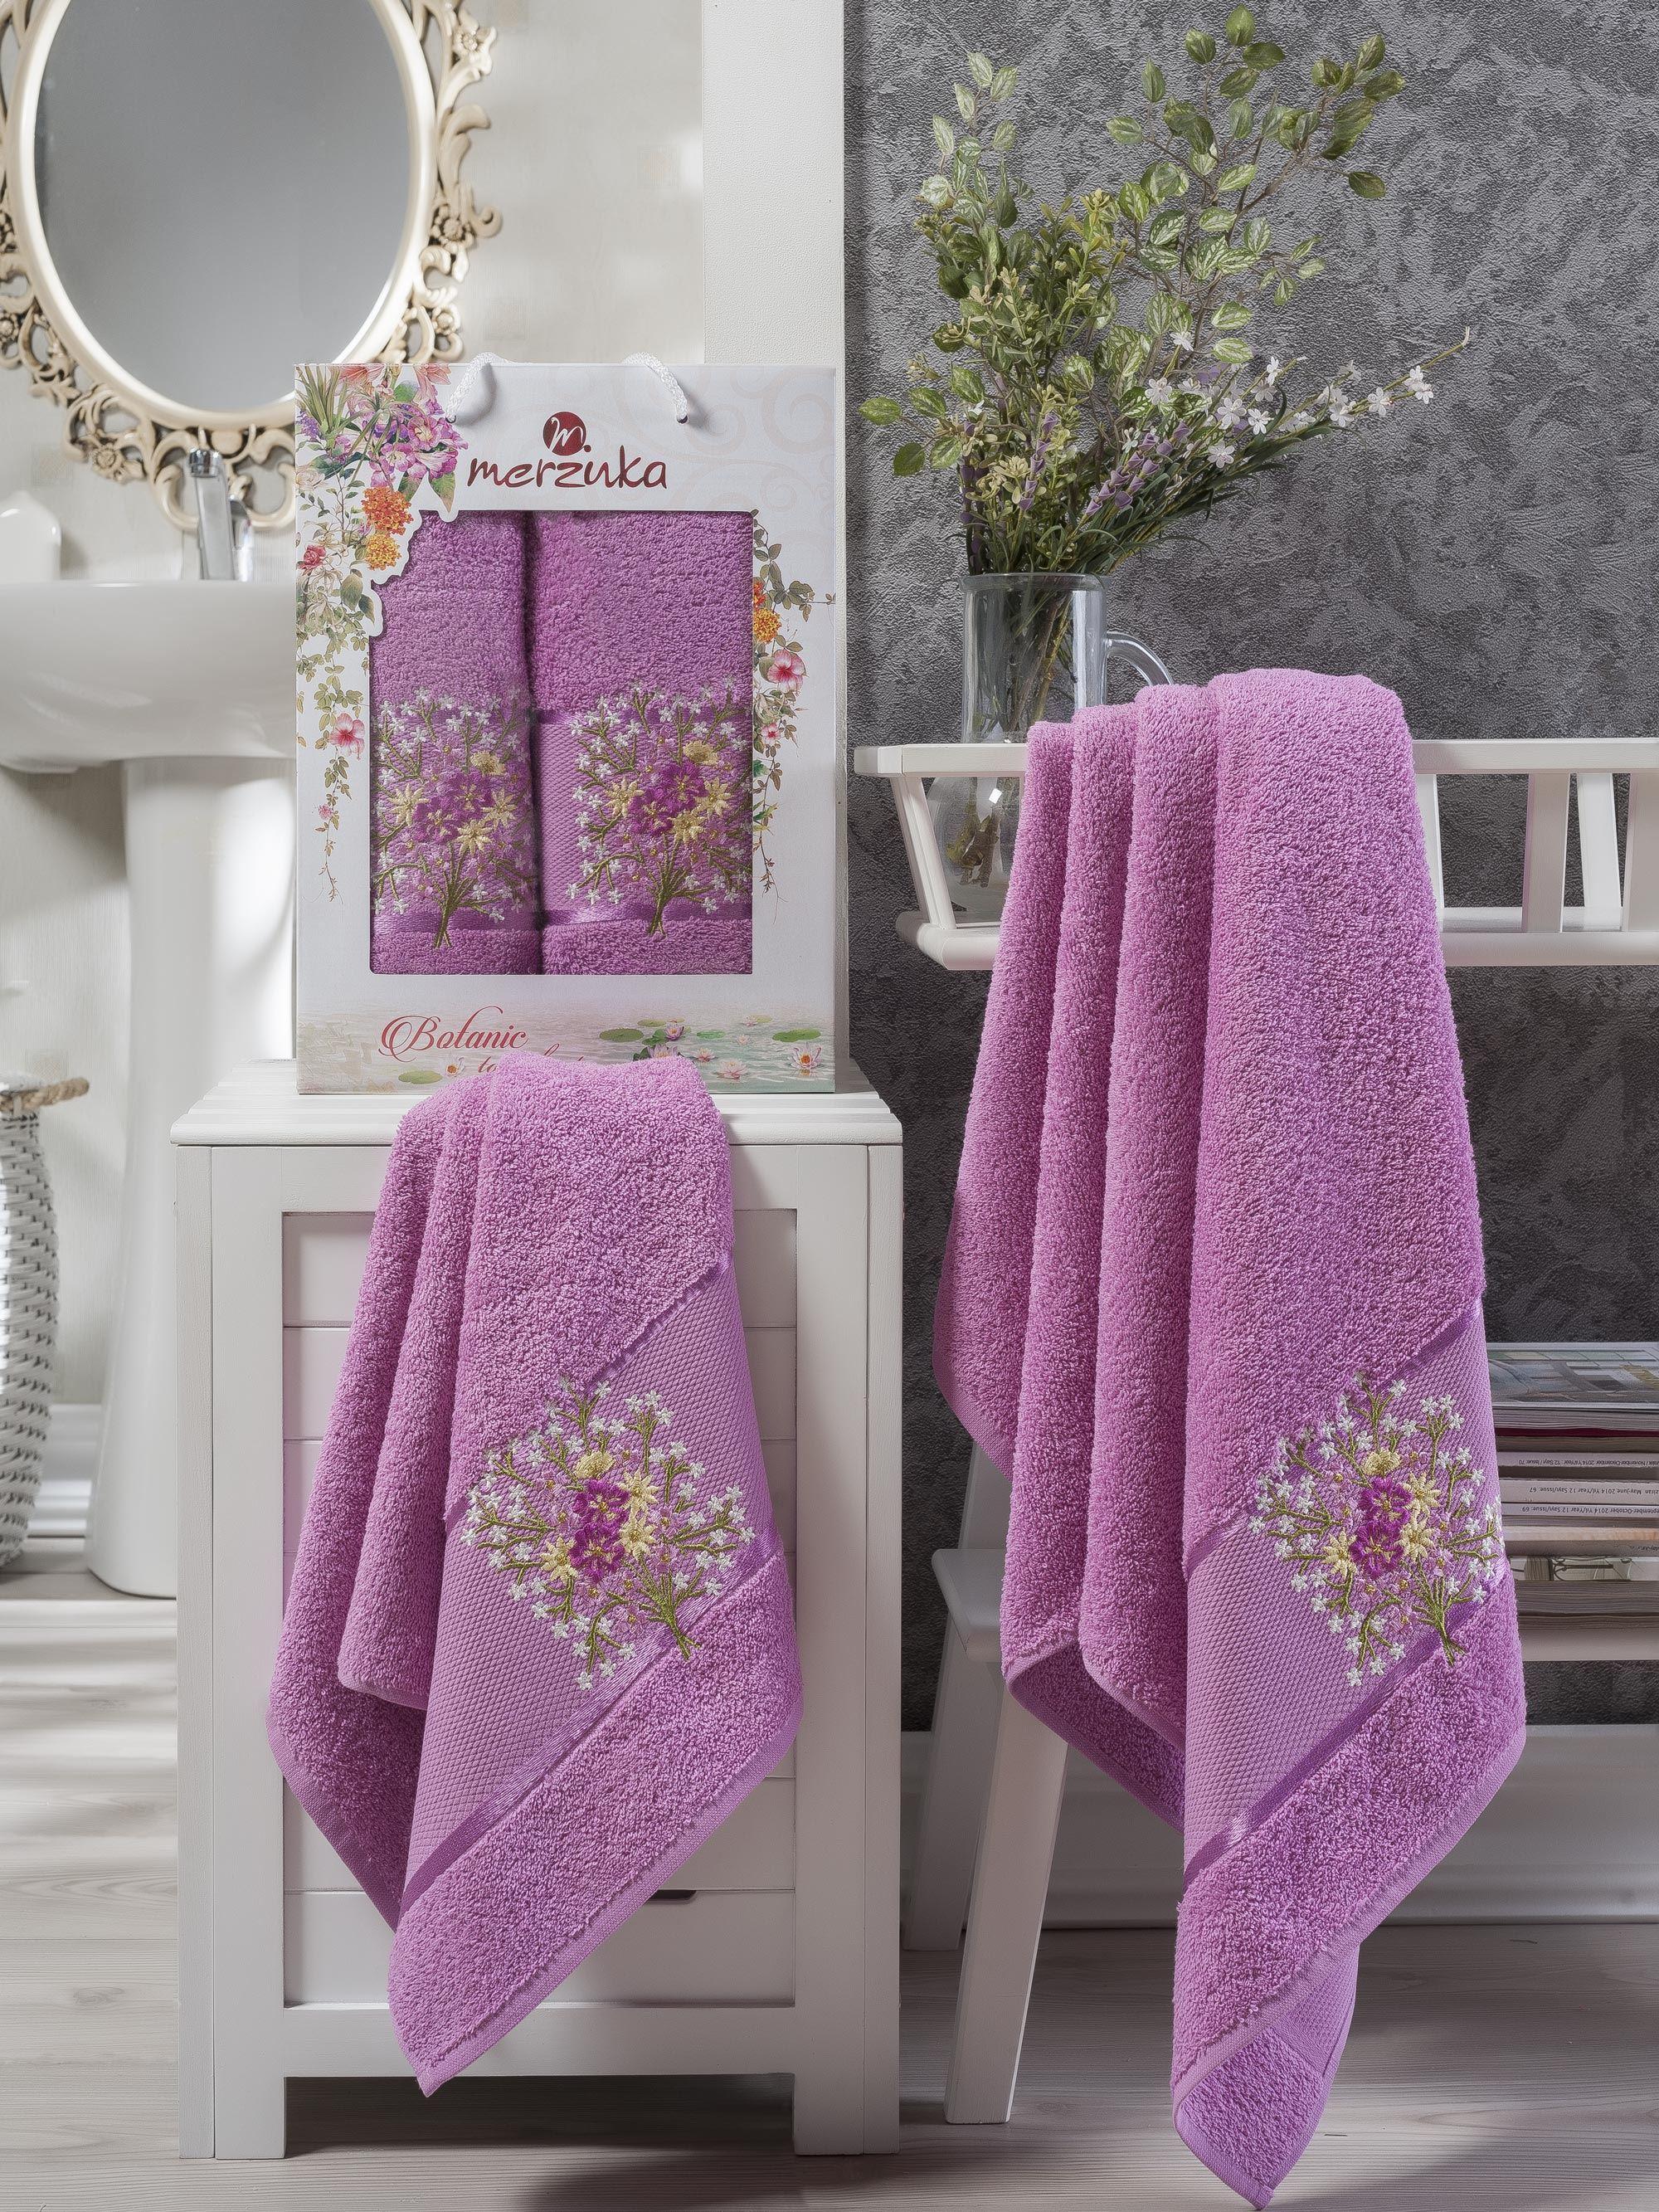 Полотенца Oran Merzuka Полотенце Botanik Цвет: Светло-Лиловый (Набор) полотенца oran merzuka полотенце sakura цвет светло лиловый набор